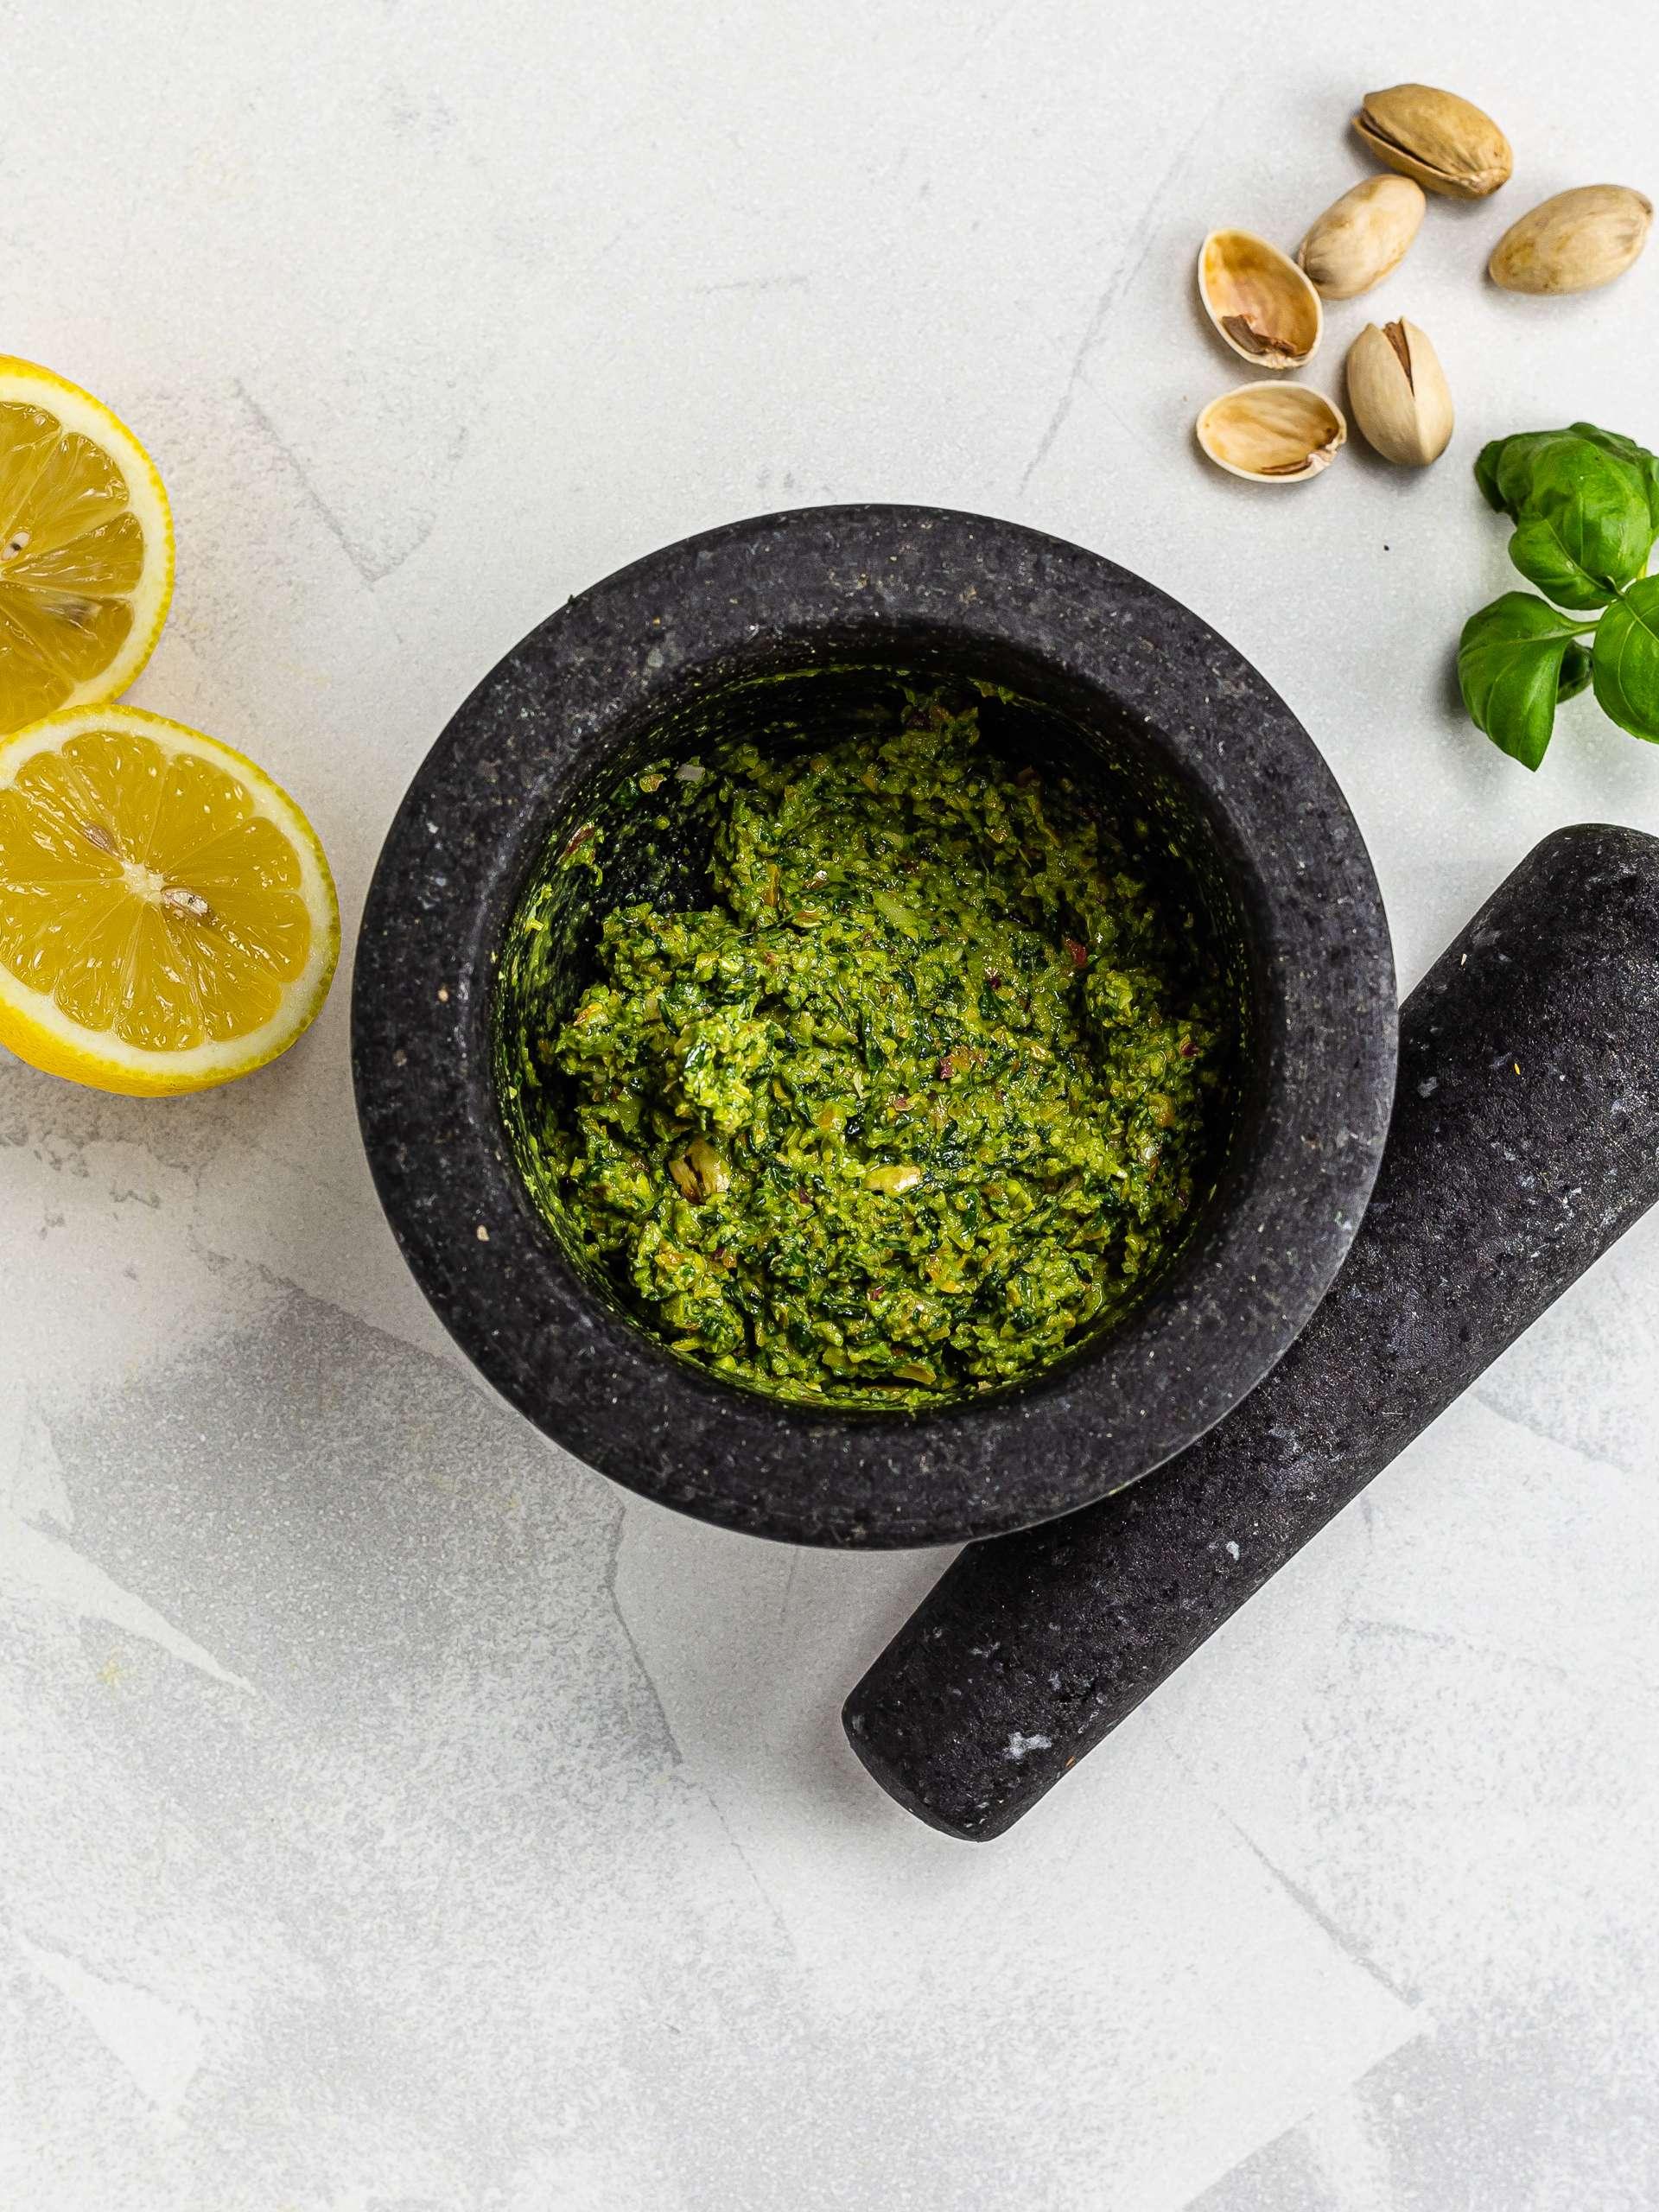 pesto with pistachios and lemon